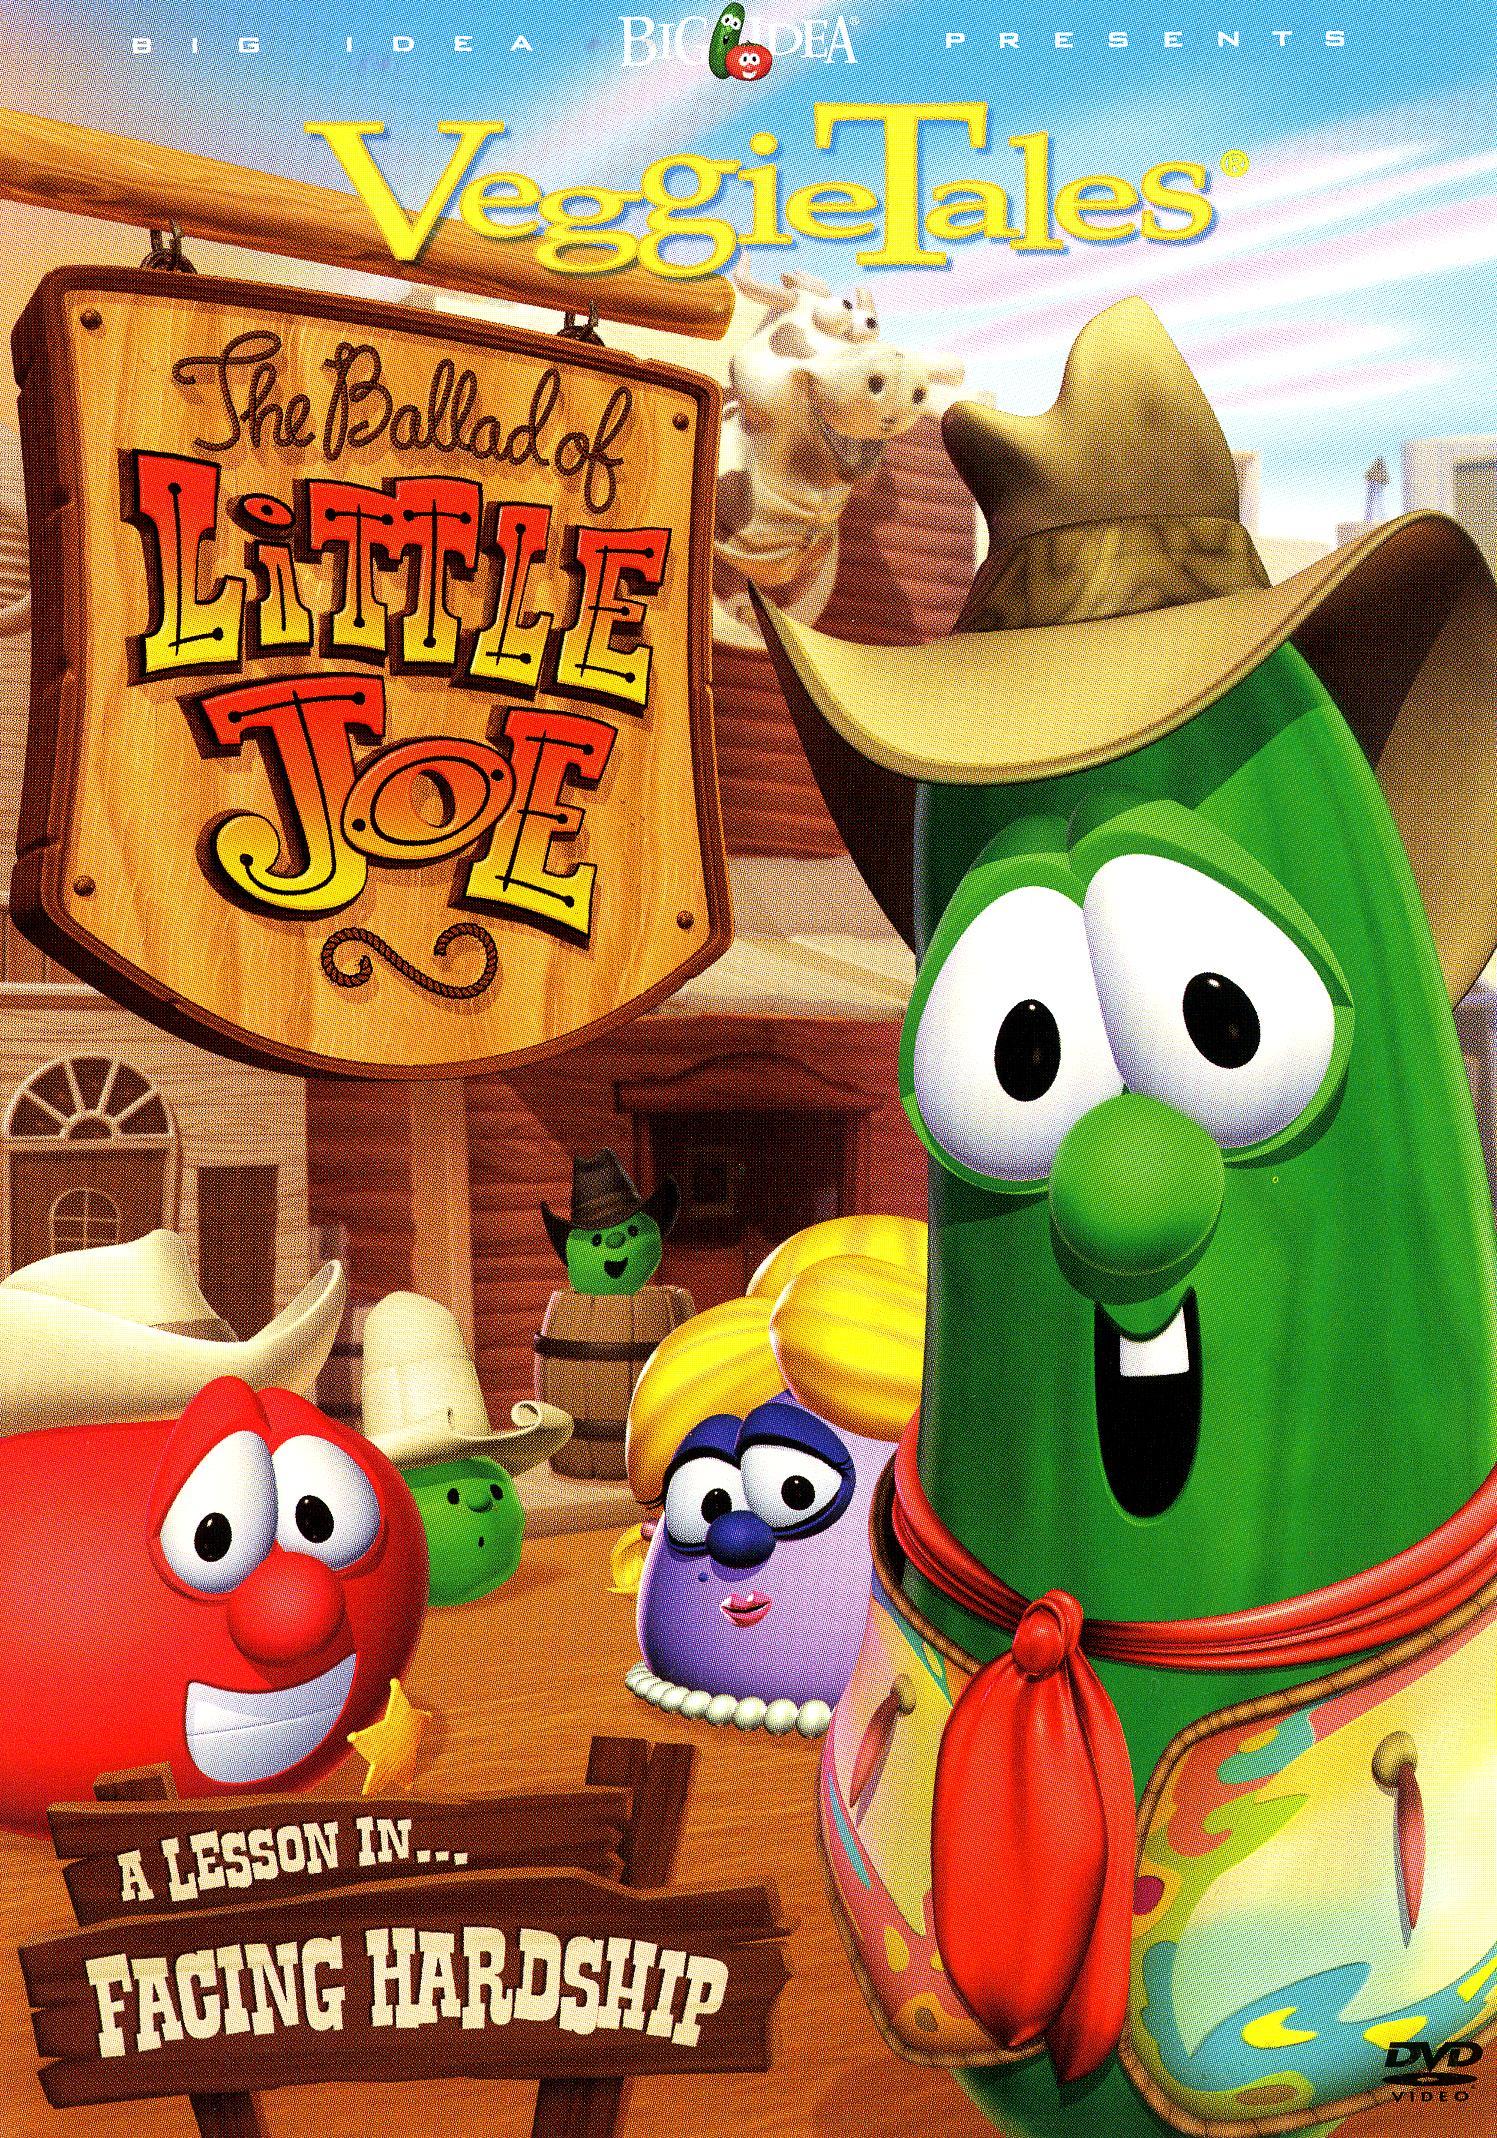 Veggie Tales: The Ballad of Little Joe - A Lesson in Trusting God